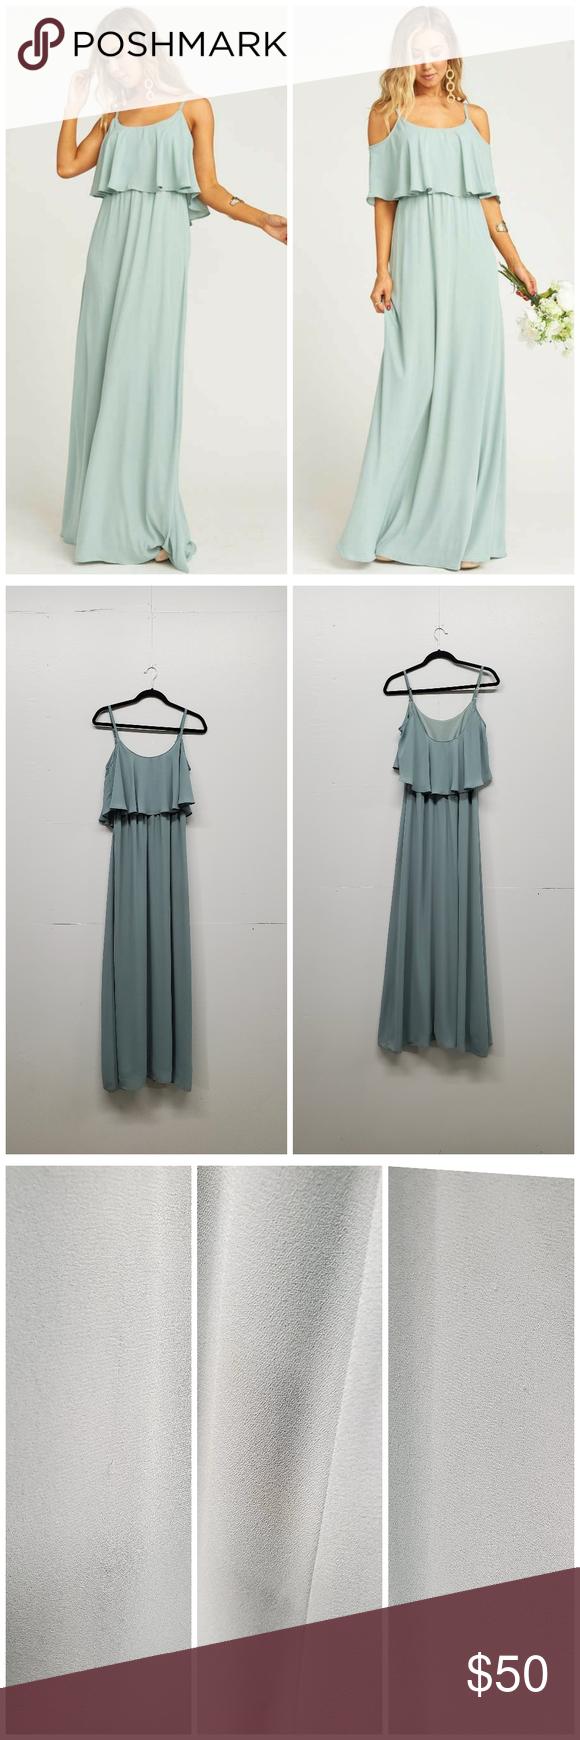 26+ Caitlin ruffle maxi dress silver sage crisp ideas in 2021